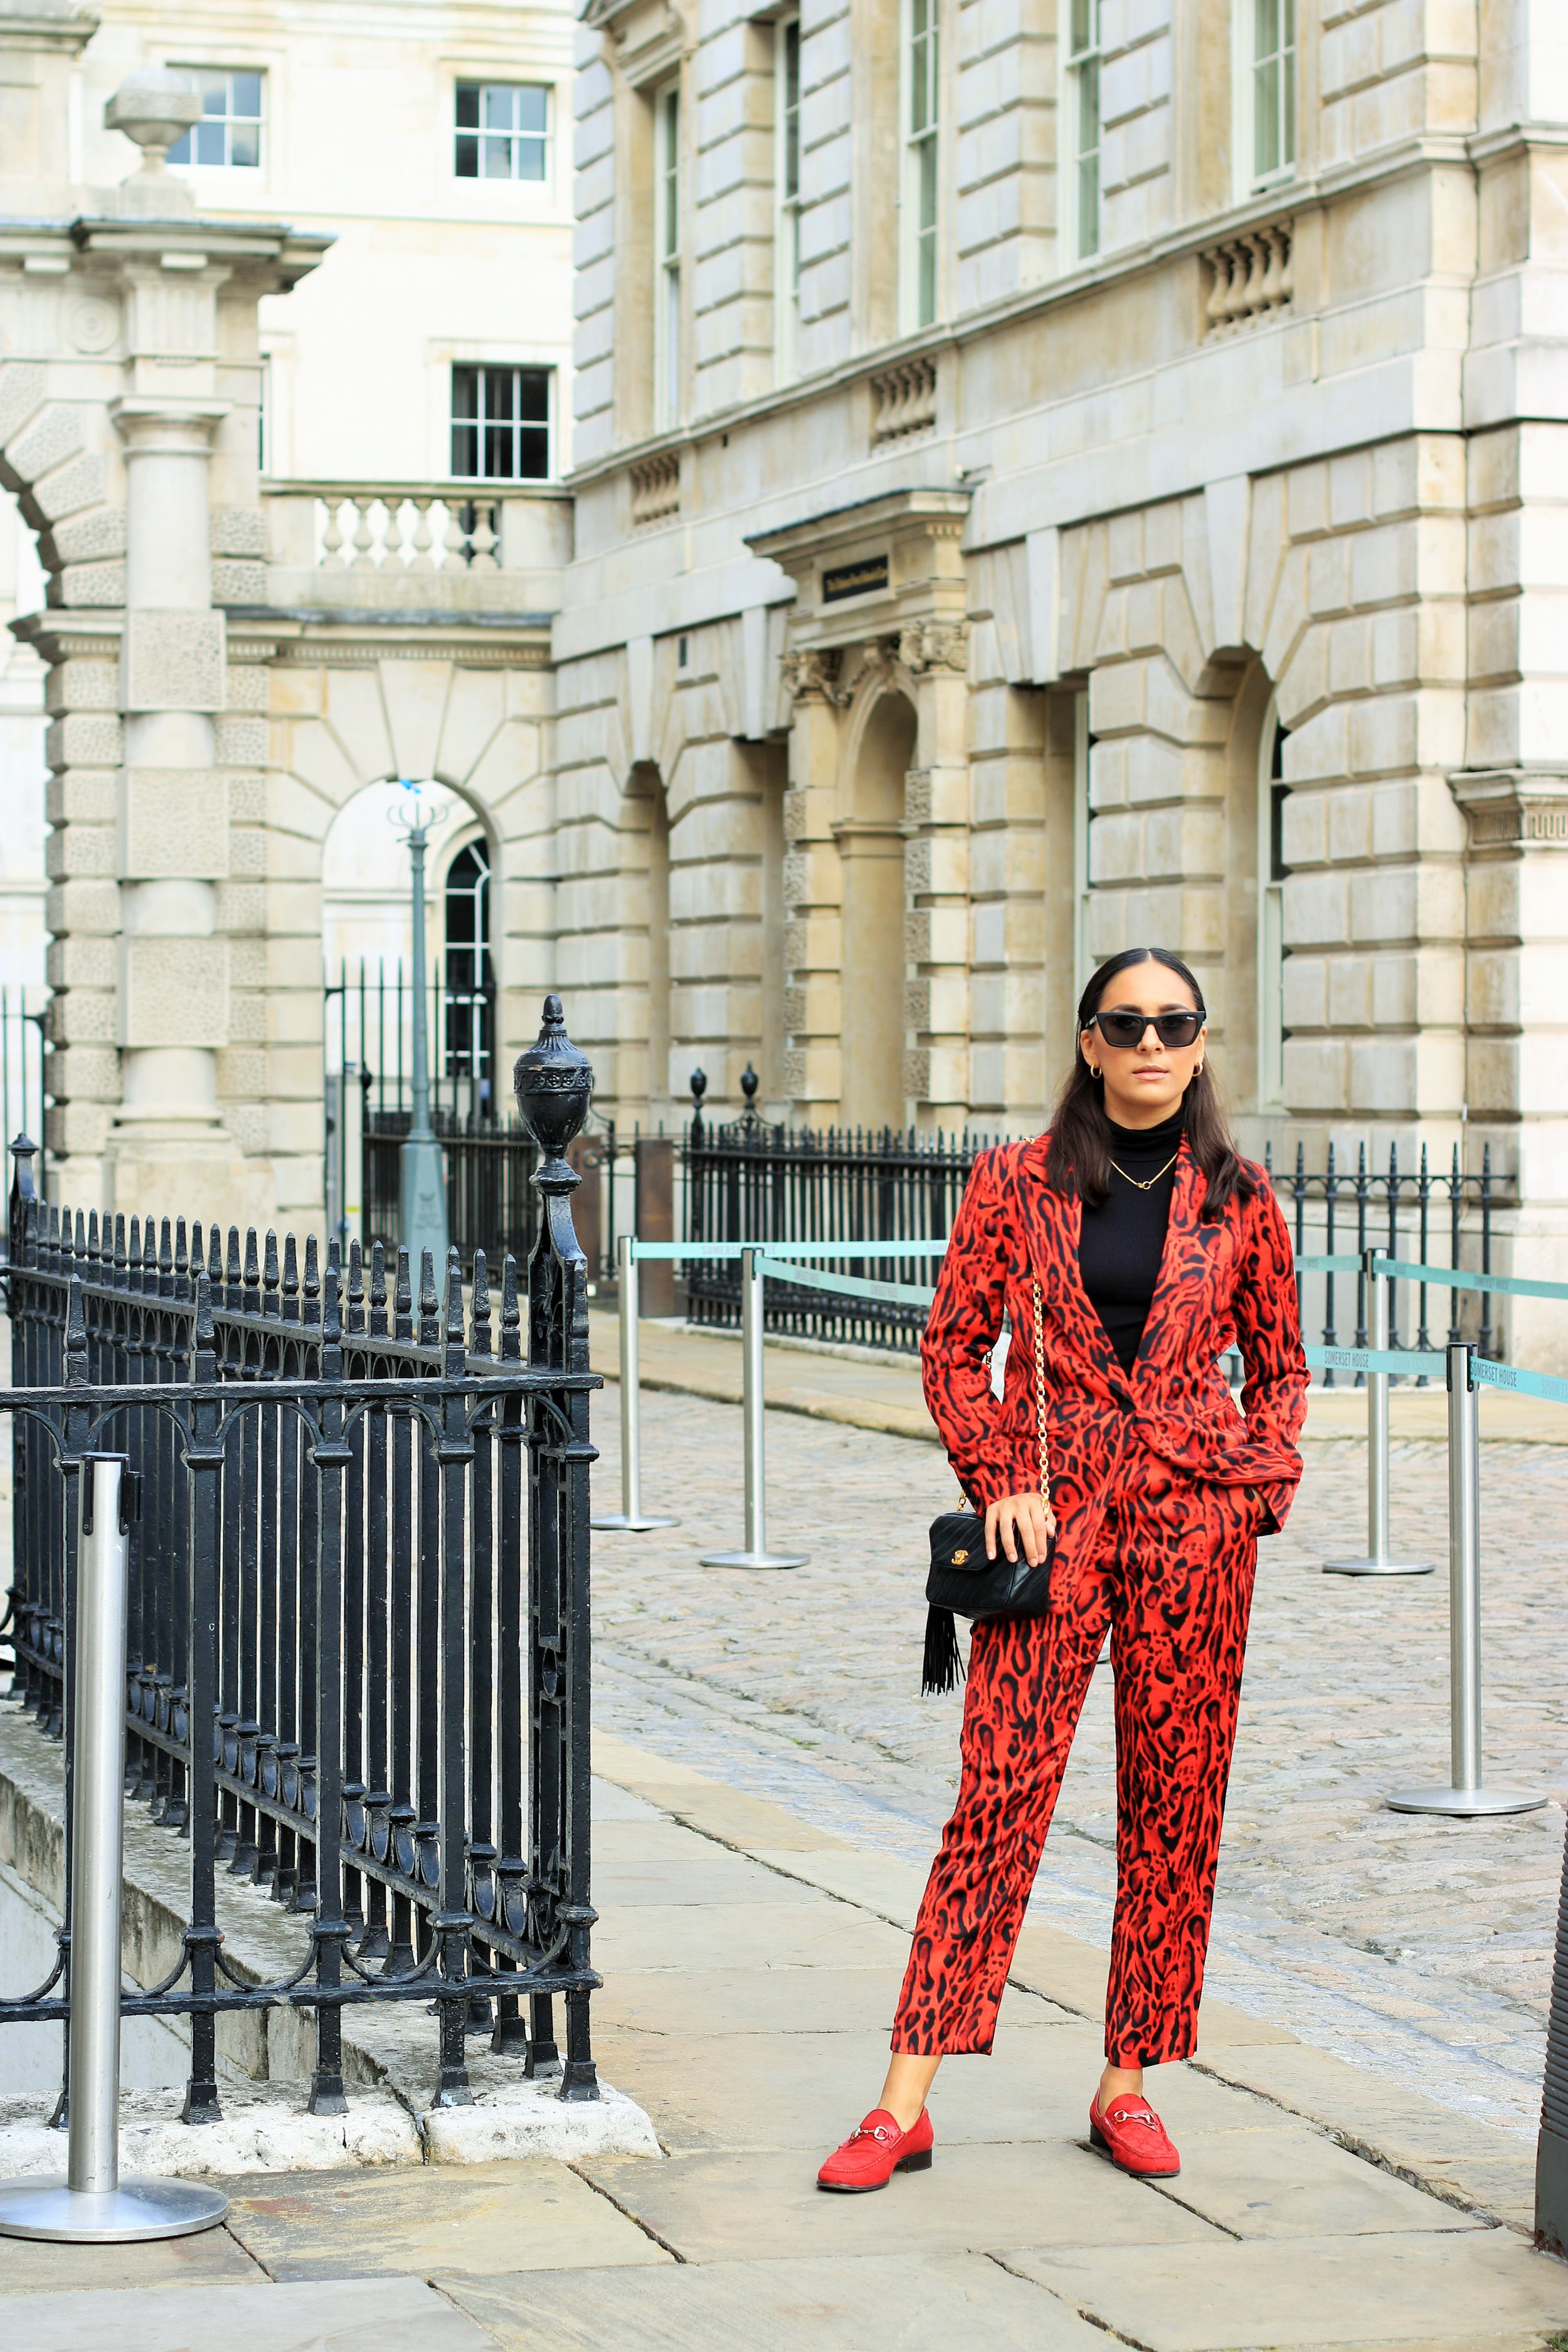 Street_Style_Leopard_Suit